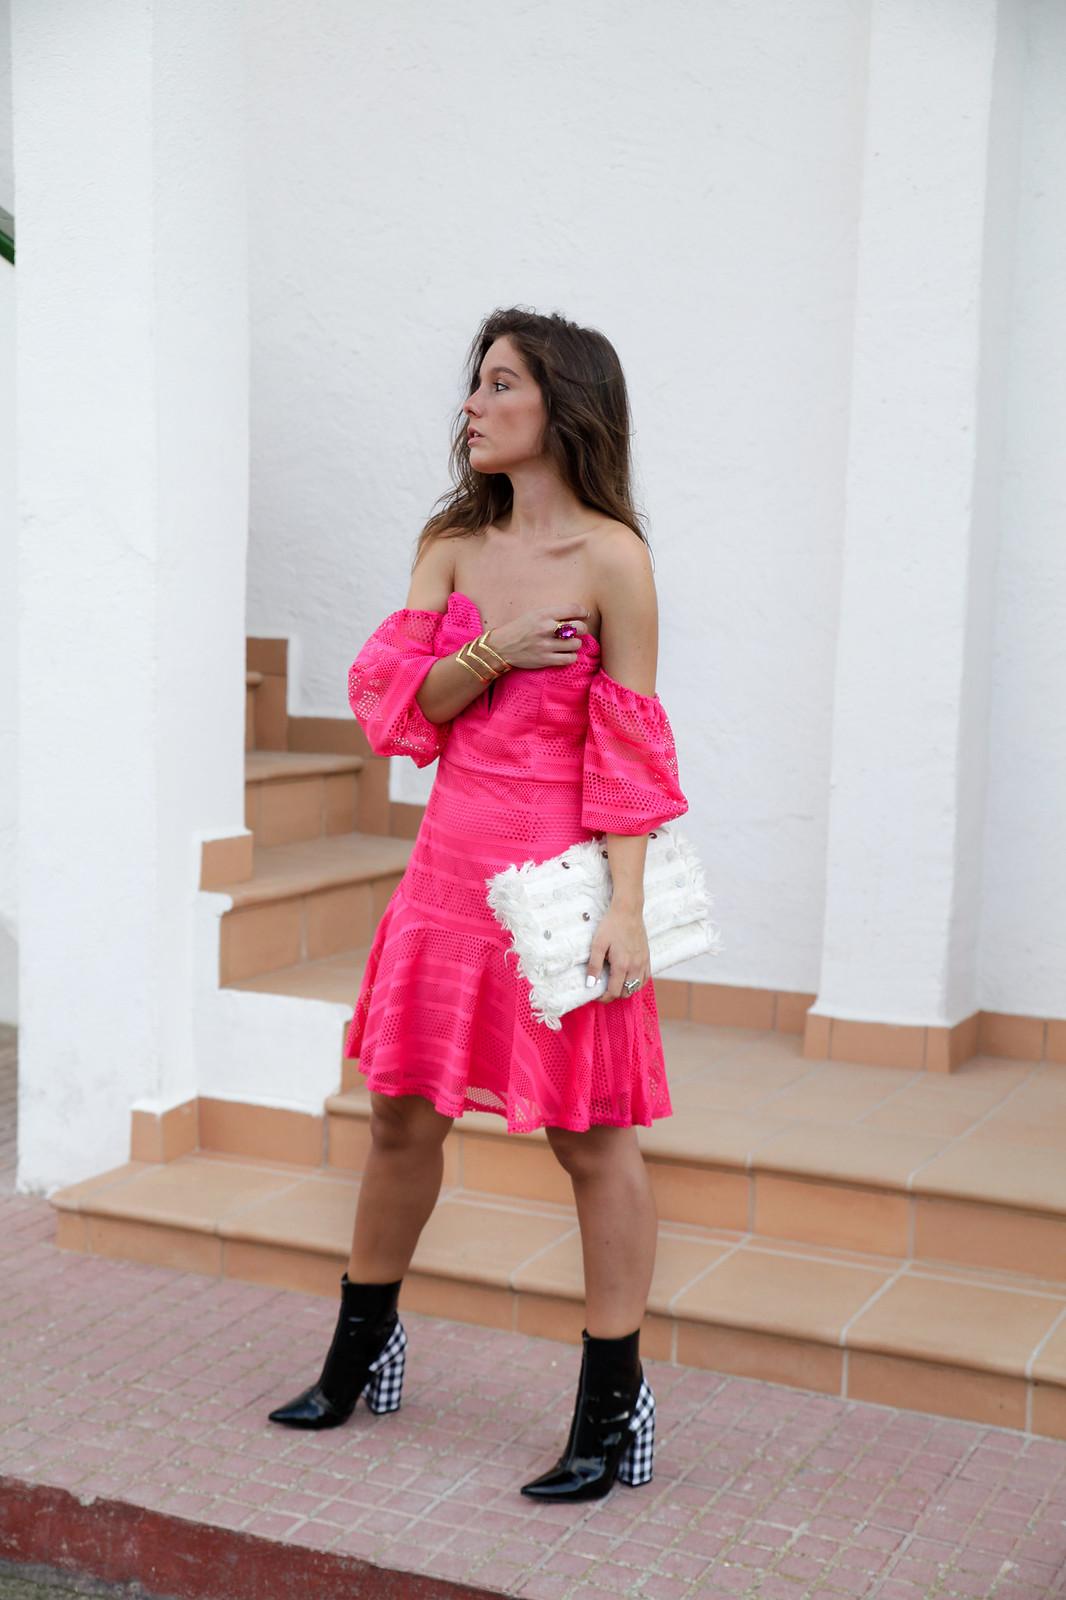 04_vestido_rosa_off_shoulder_danity_paris_pink_dress_theguestgirl_outfit_boots_vichy_trend_alert